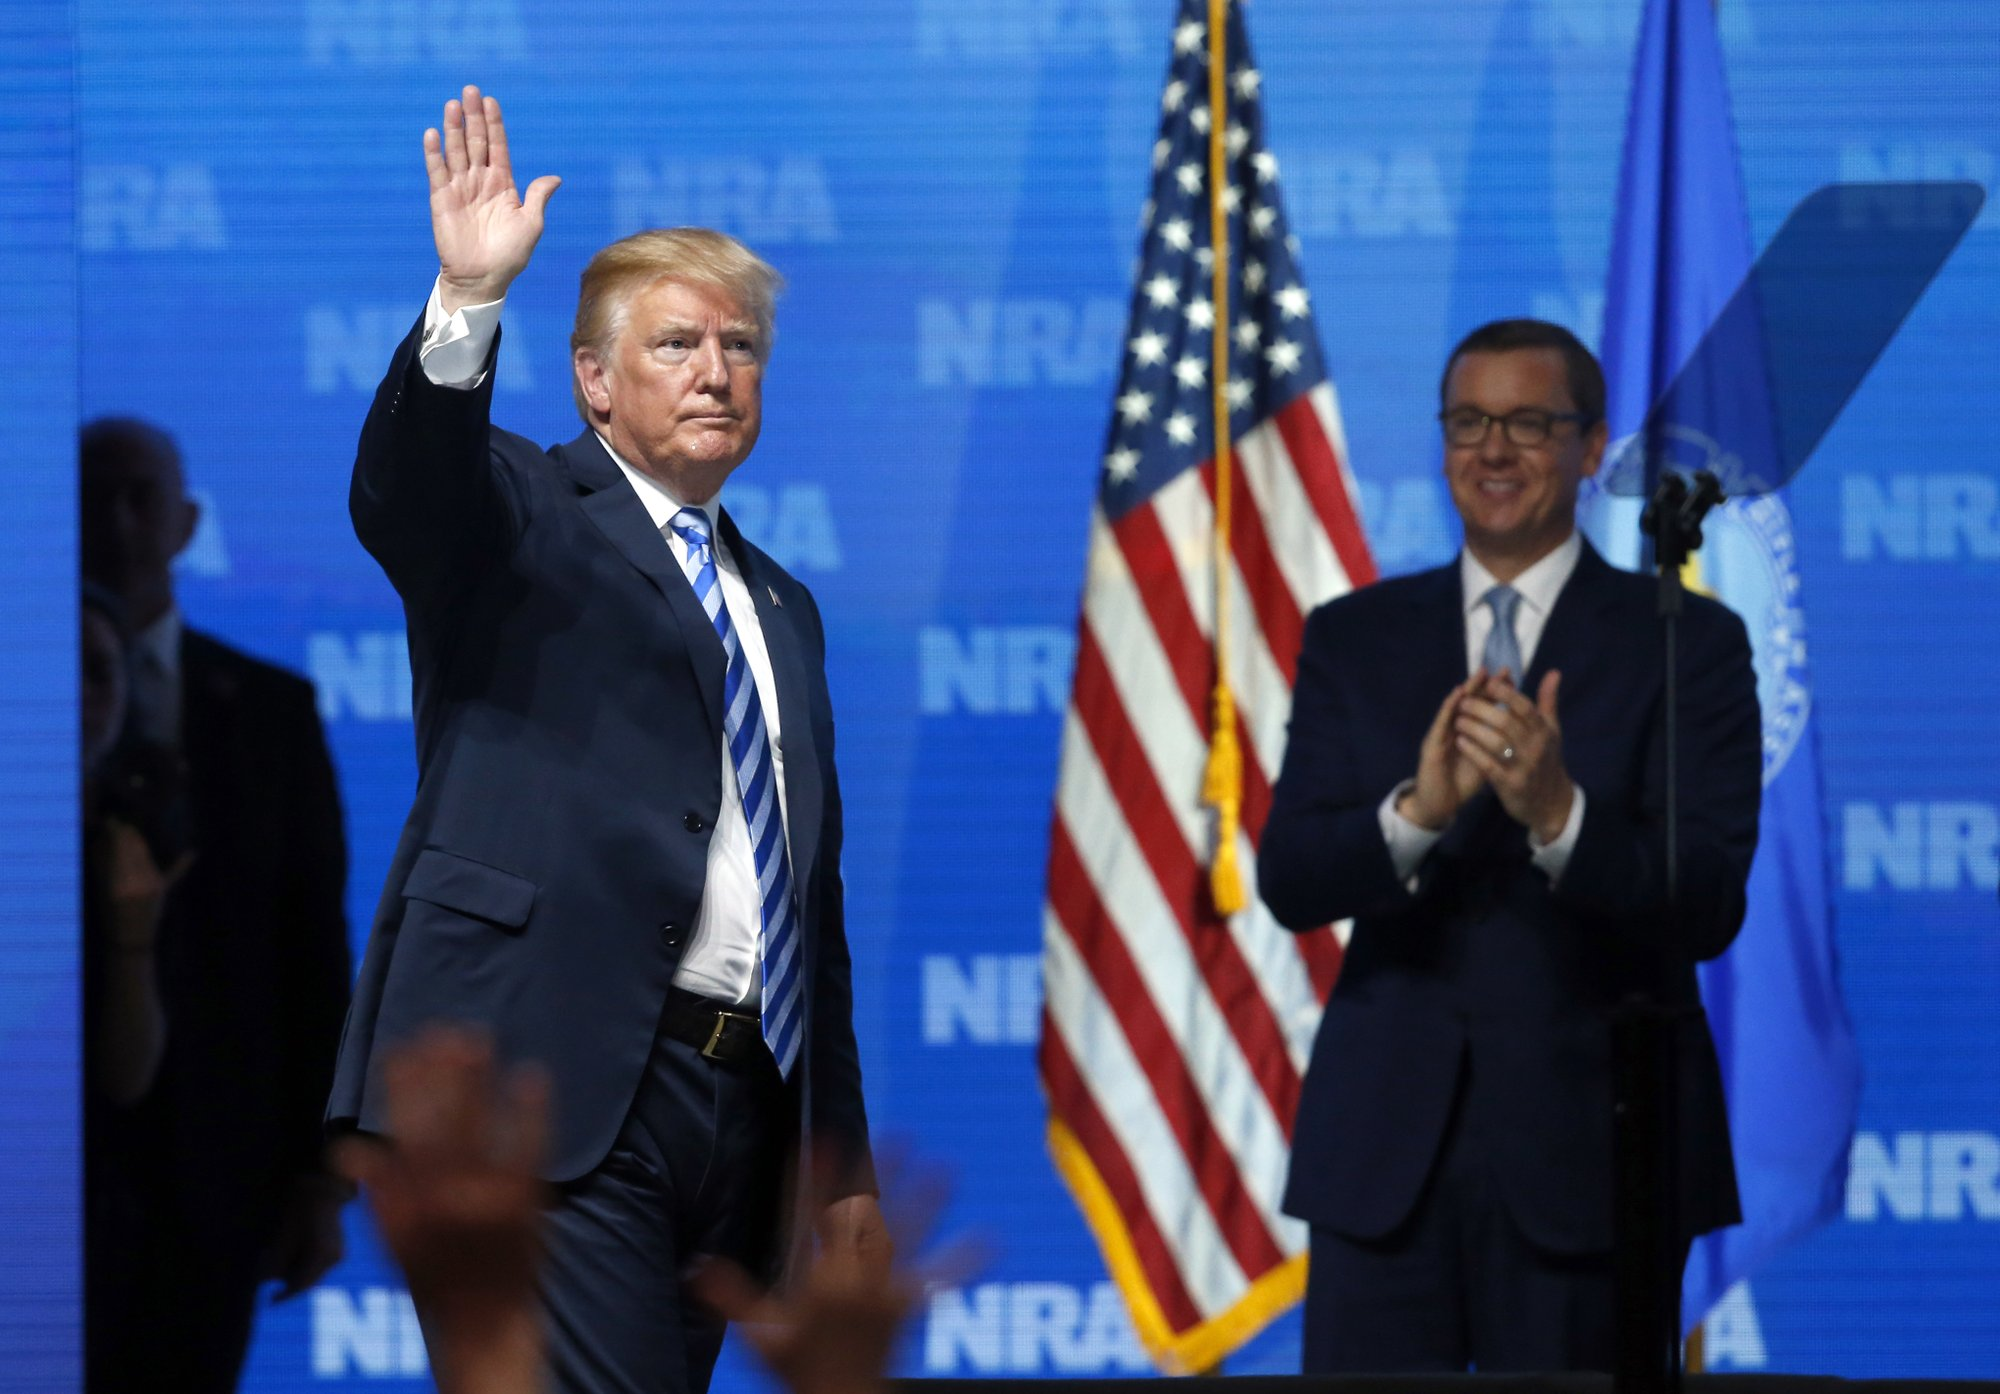 France slams Trump for remarks on guns and Paris attacks